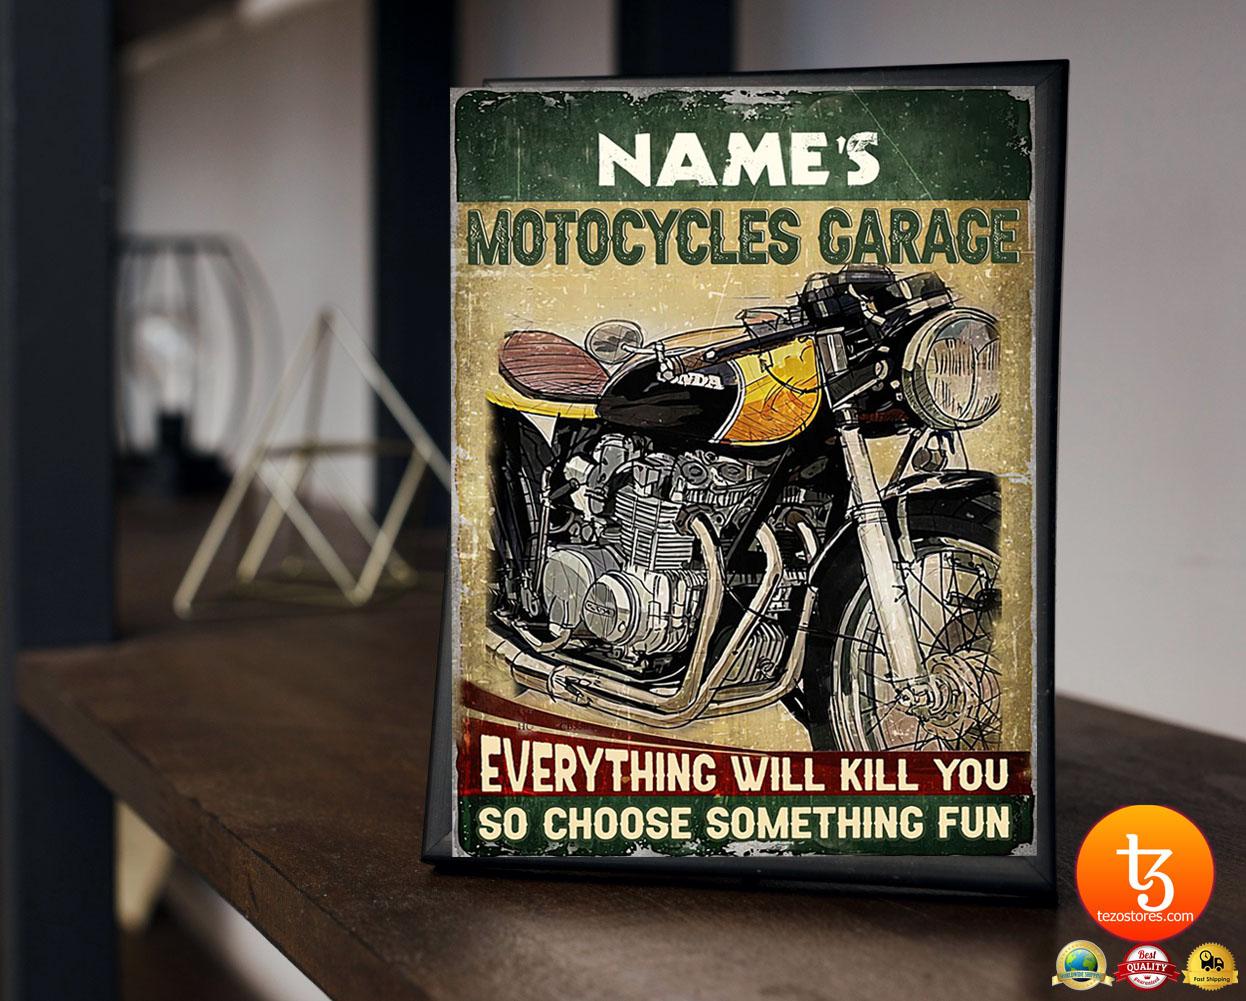 Motocycles garage eveyrthing will kill you so choose something fun custom name poster 2